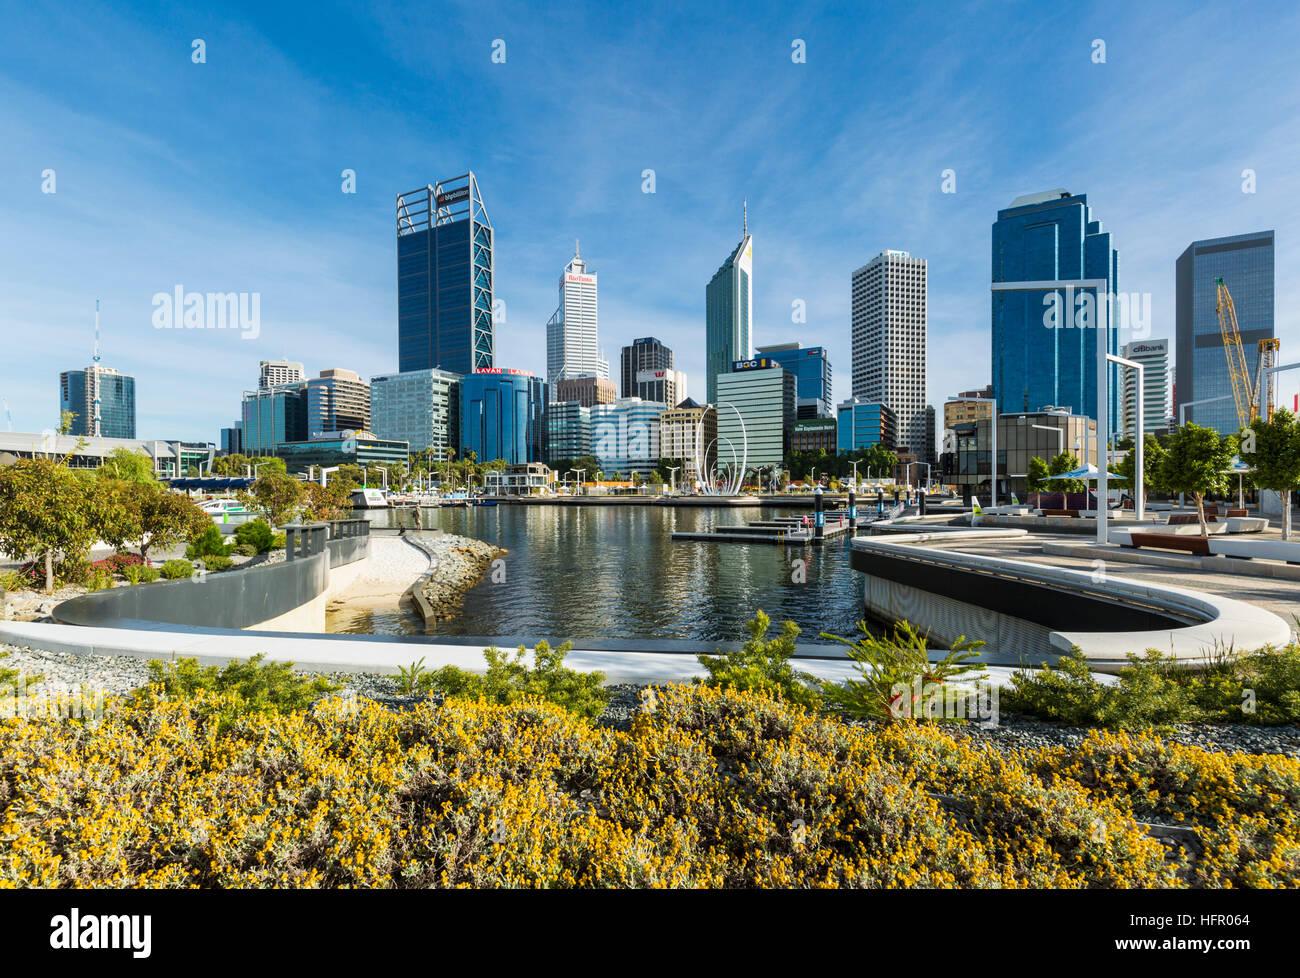 View across Elizabeth Quay to the city skyline, Perth, Western Australia, Australia - Stock Image